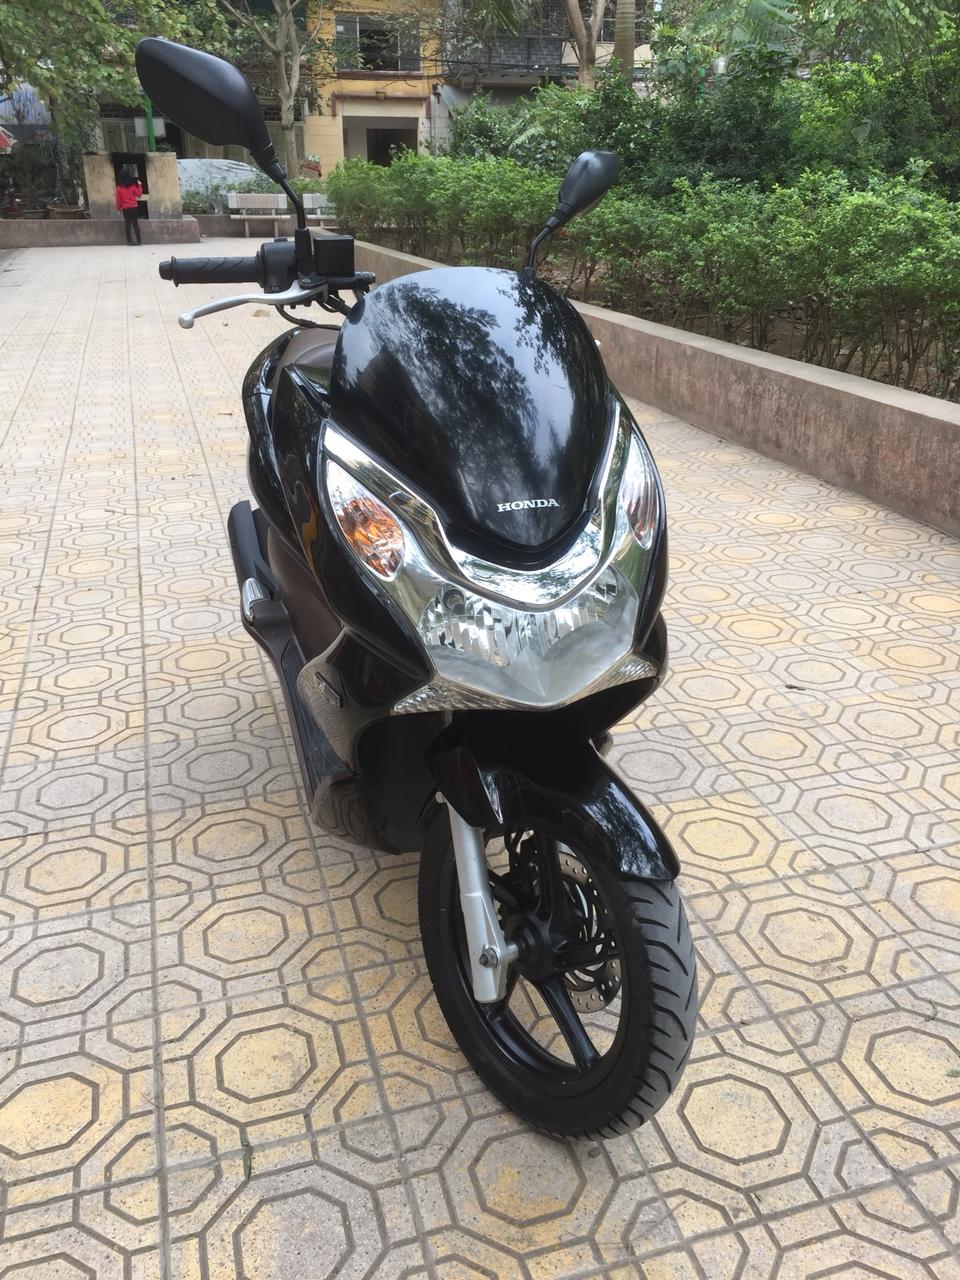 Rao ban Honda Pcx 125 fi nhap khau Thai 2011 nguyen ban chinh chu su dung - 4